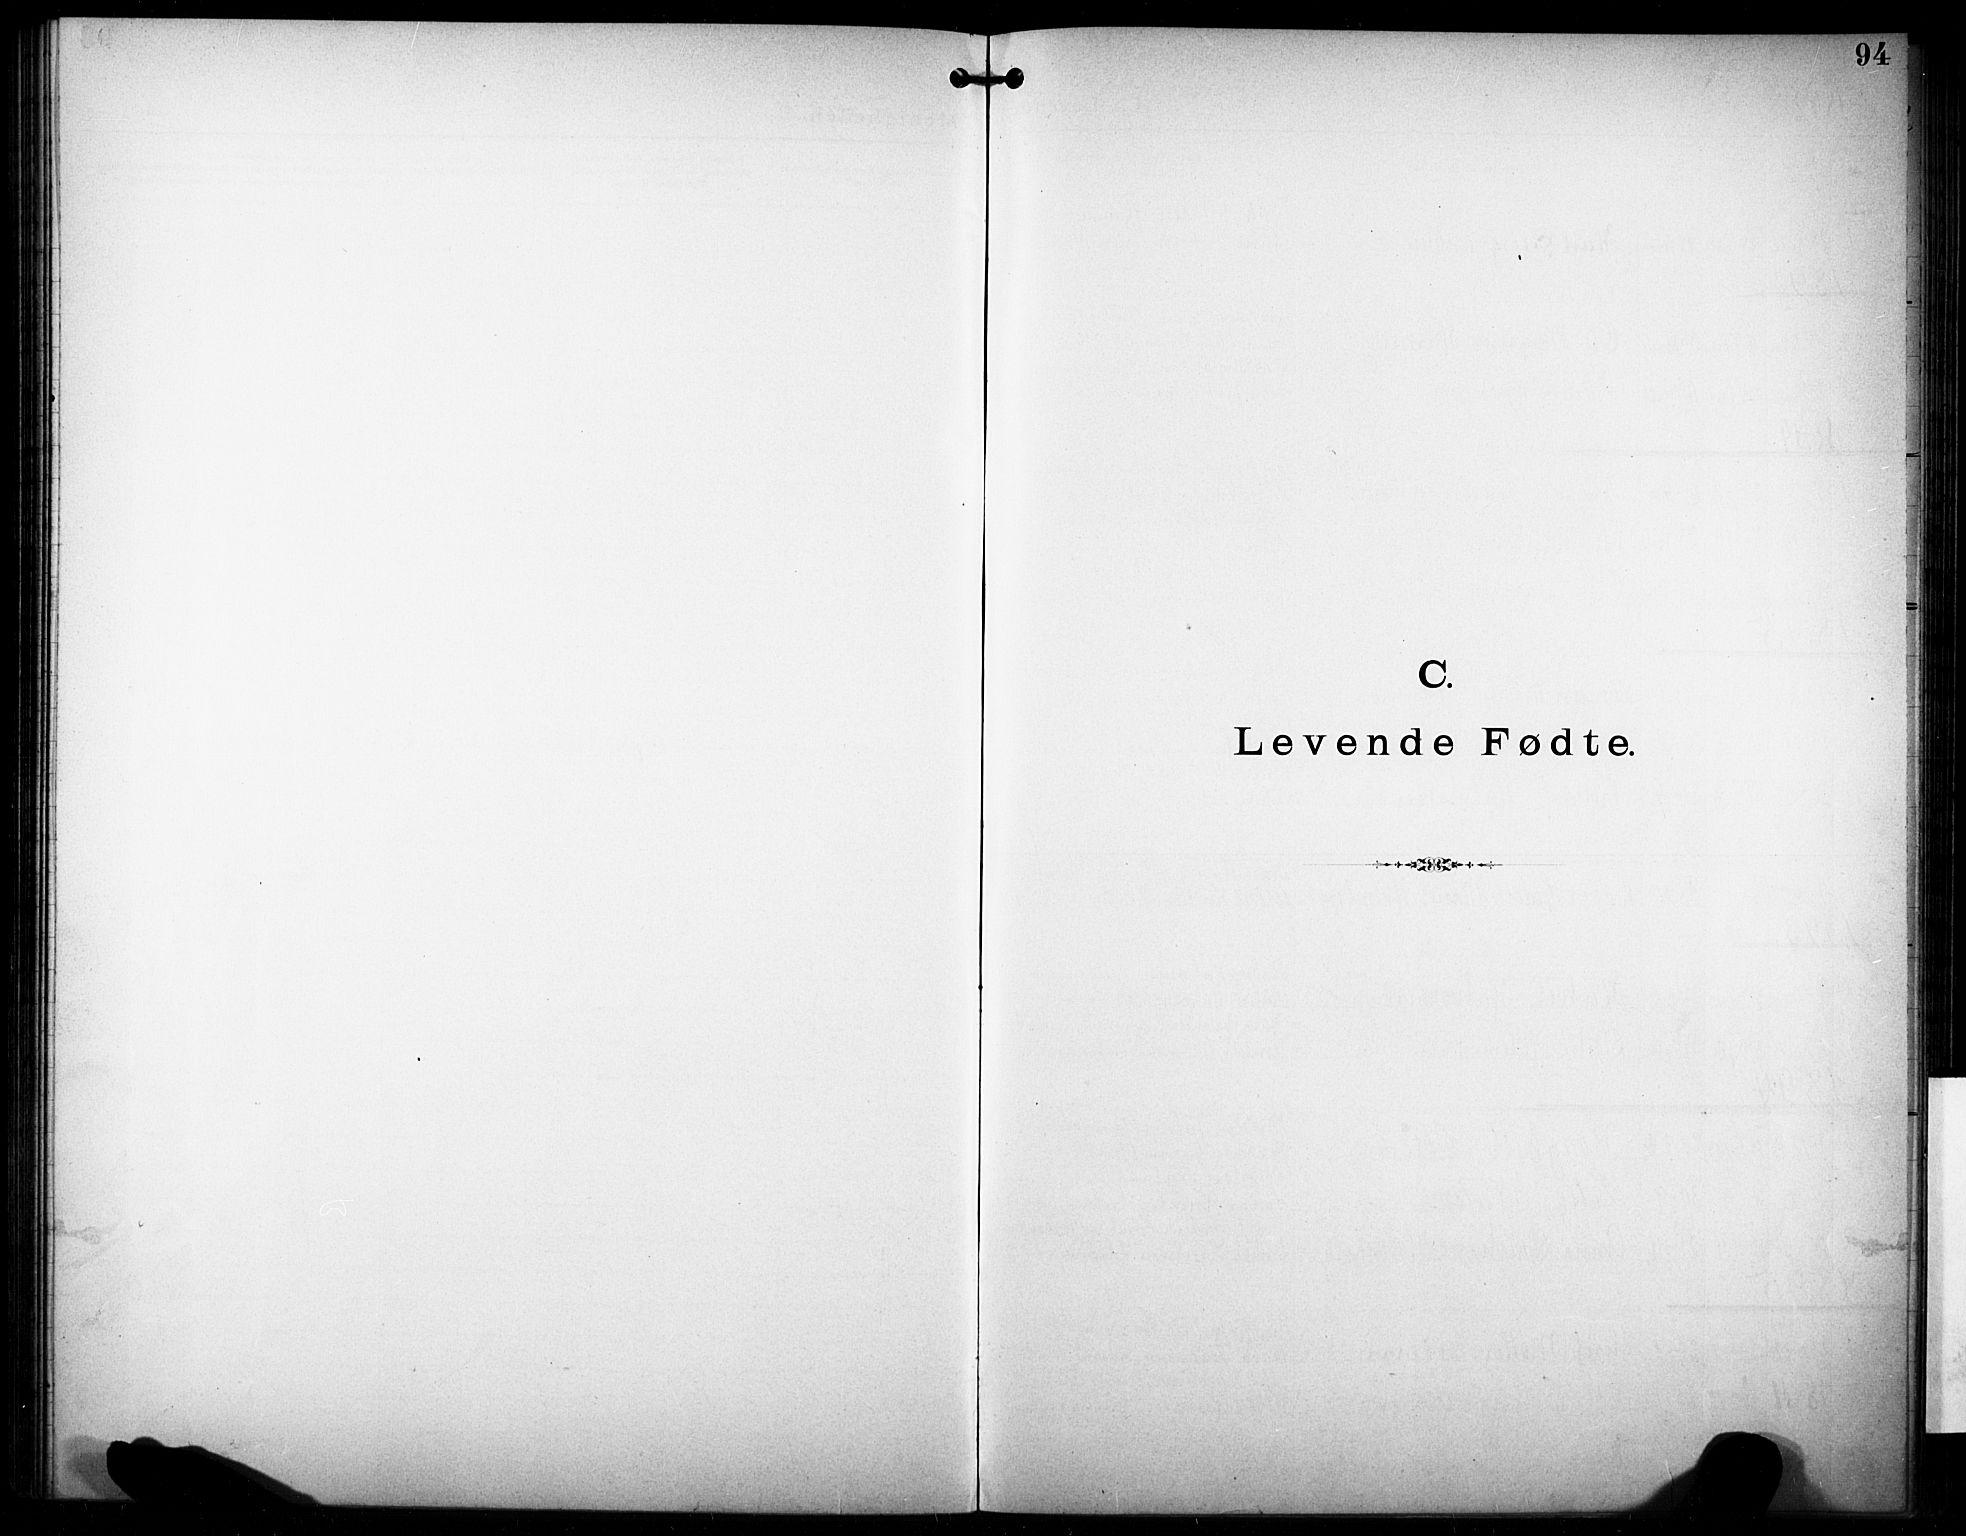 SAKO, Den katolsk-apostoliske menighet i Larvik, F/Fa/L0001: Dissenterprotokoll nr. 1, 1892-1933, s. 94